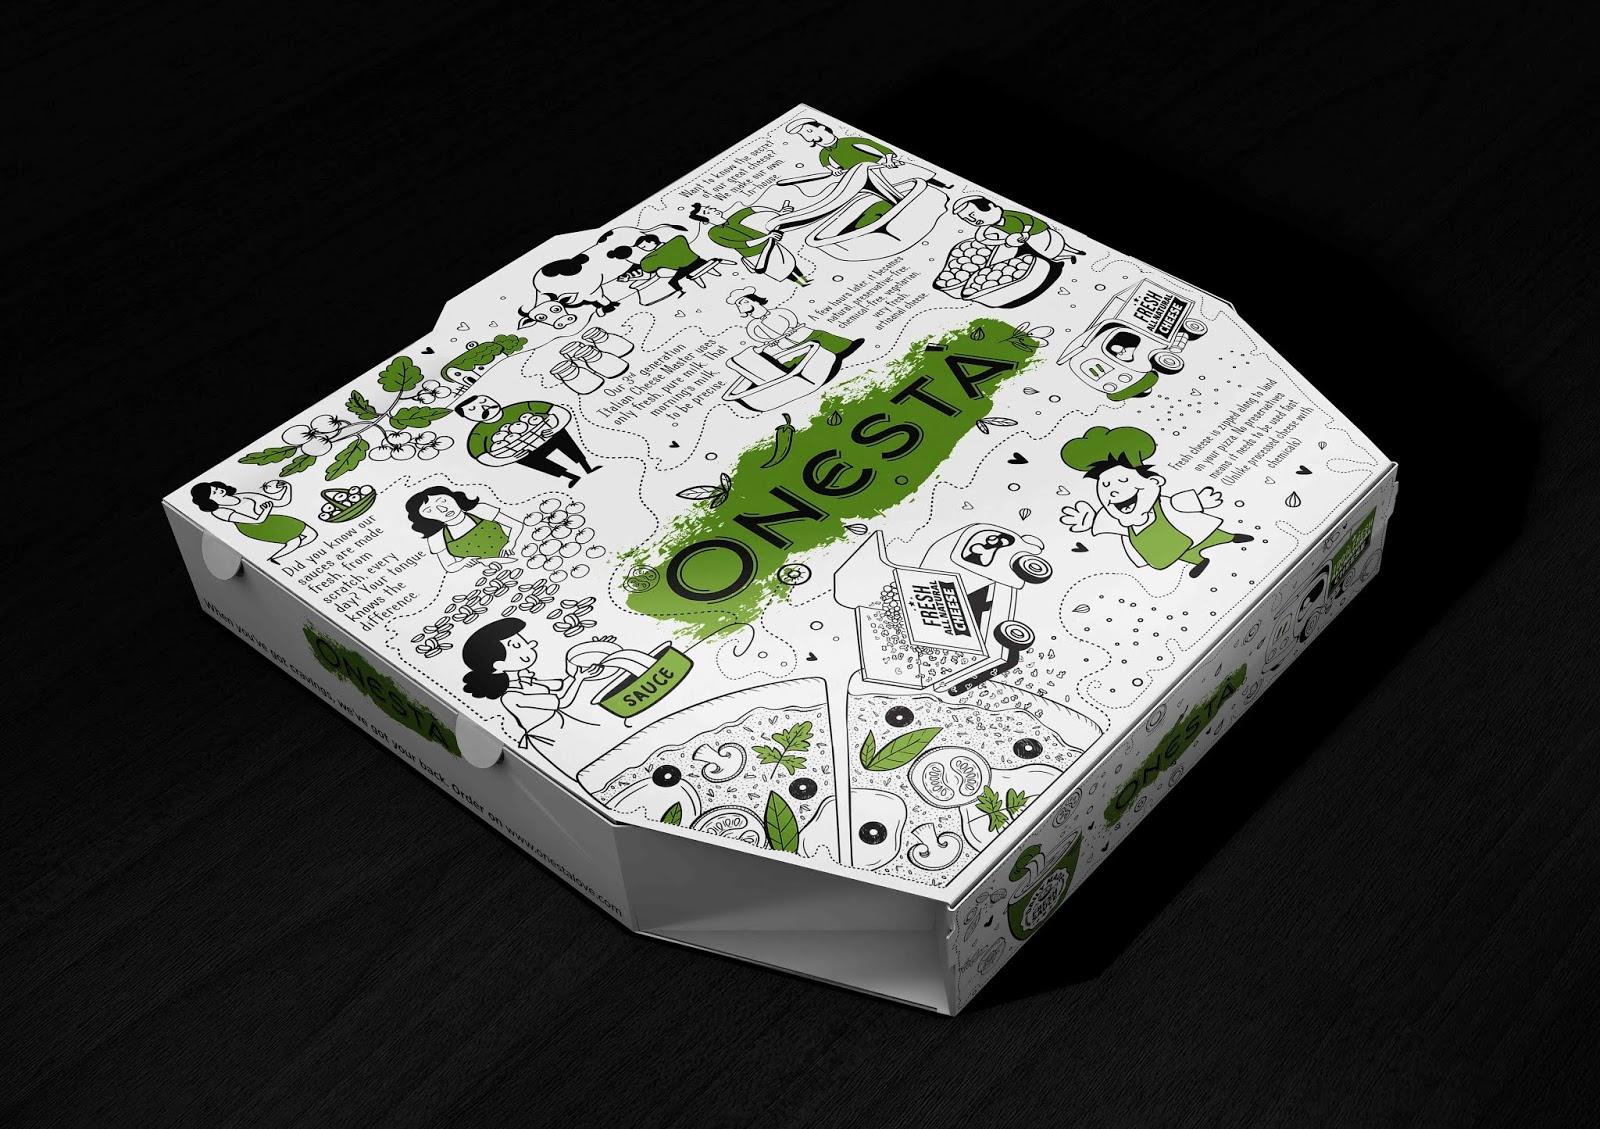 Onesta比萨外卖包装盒设计